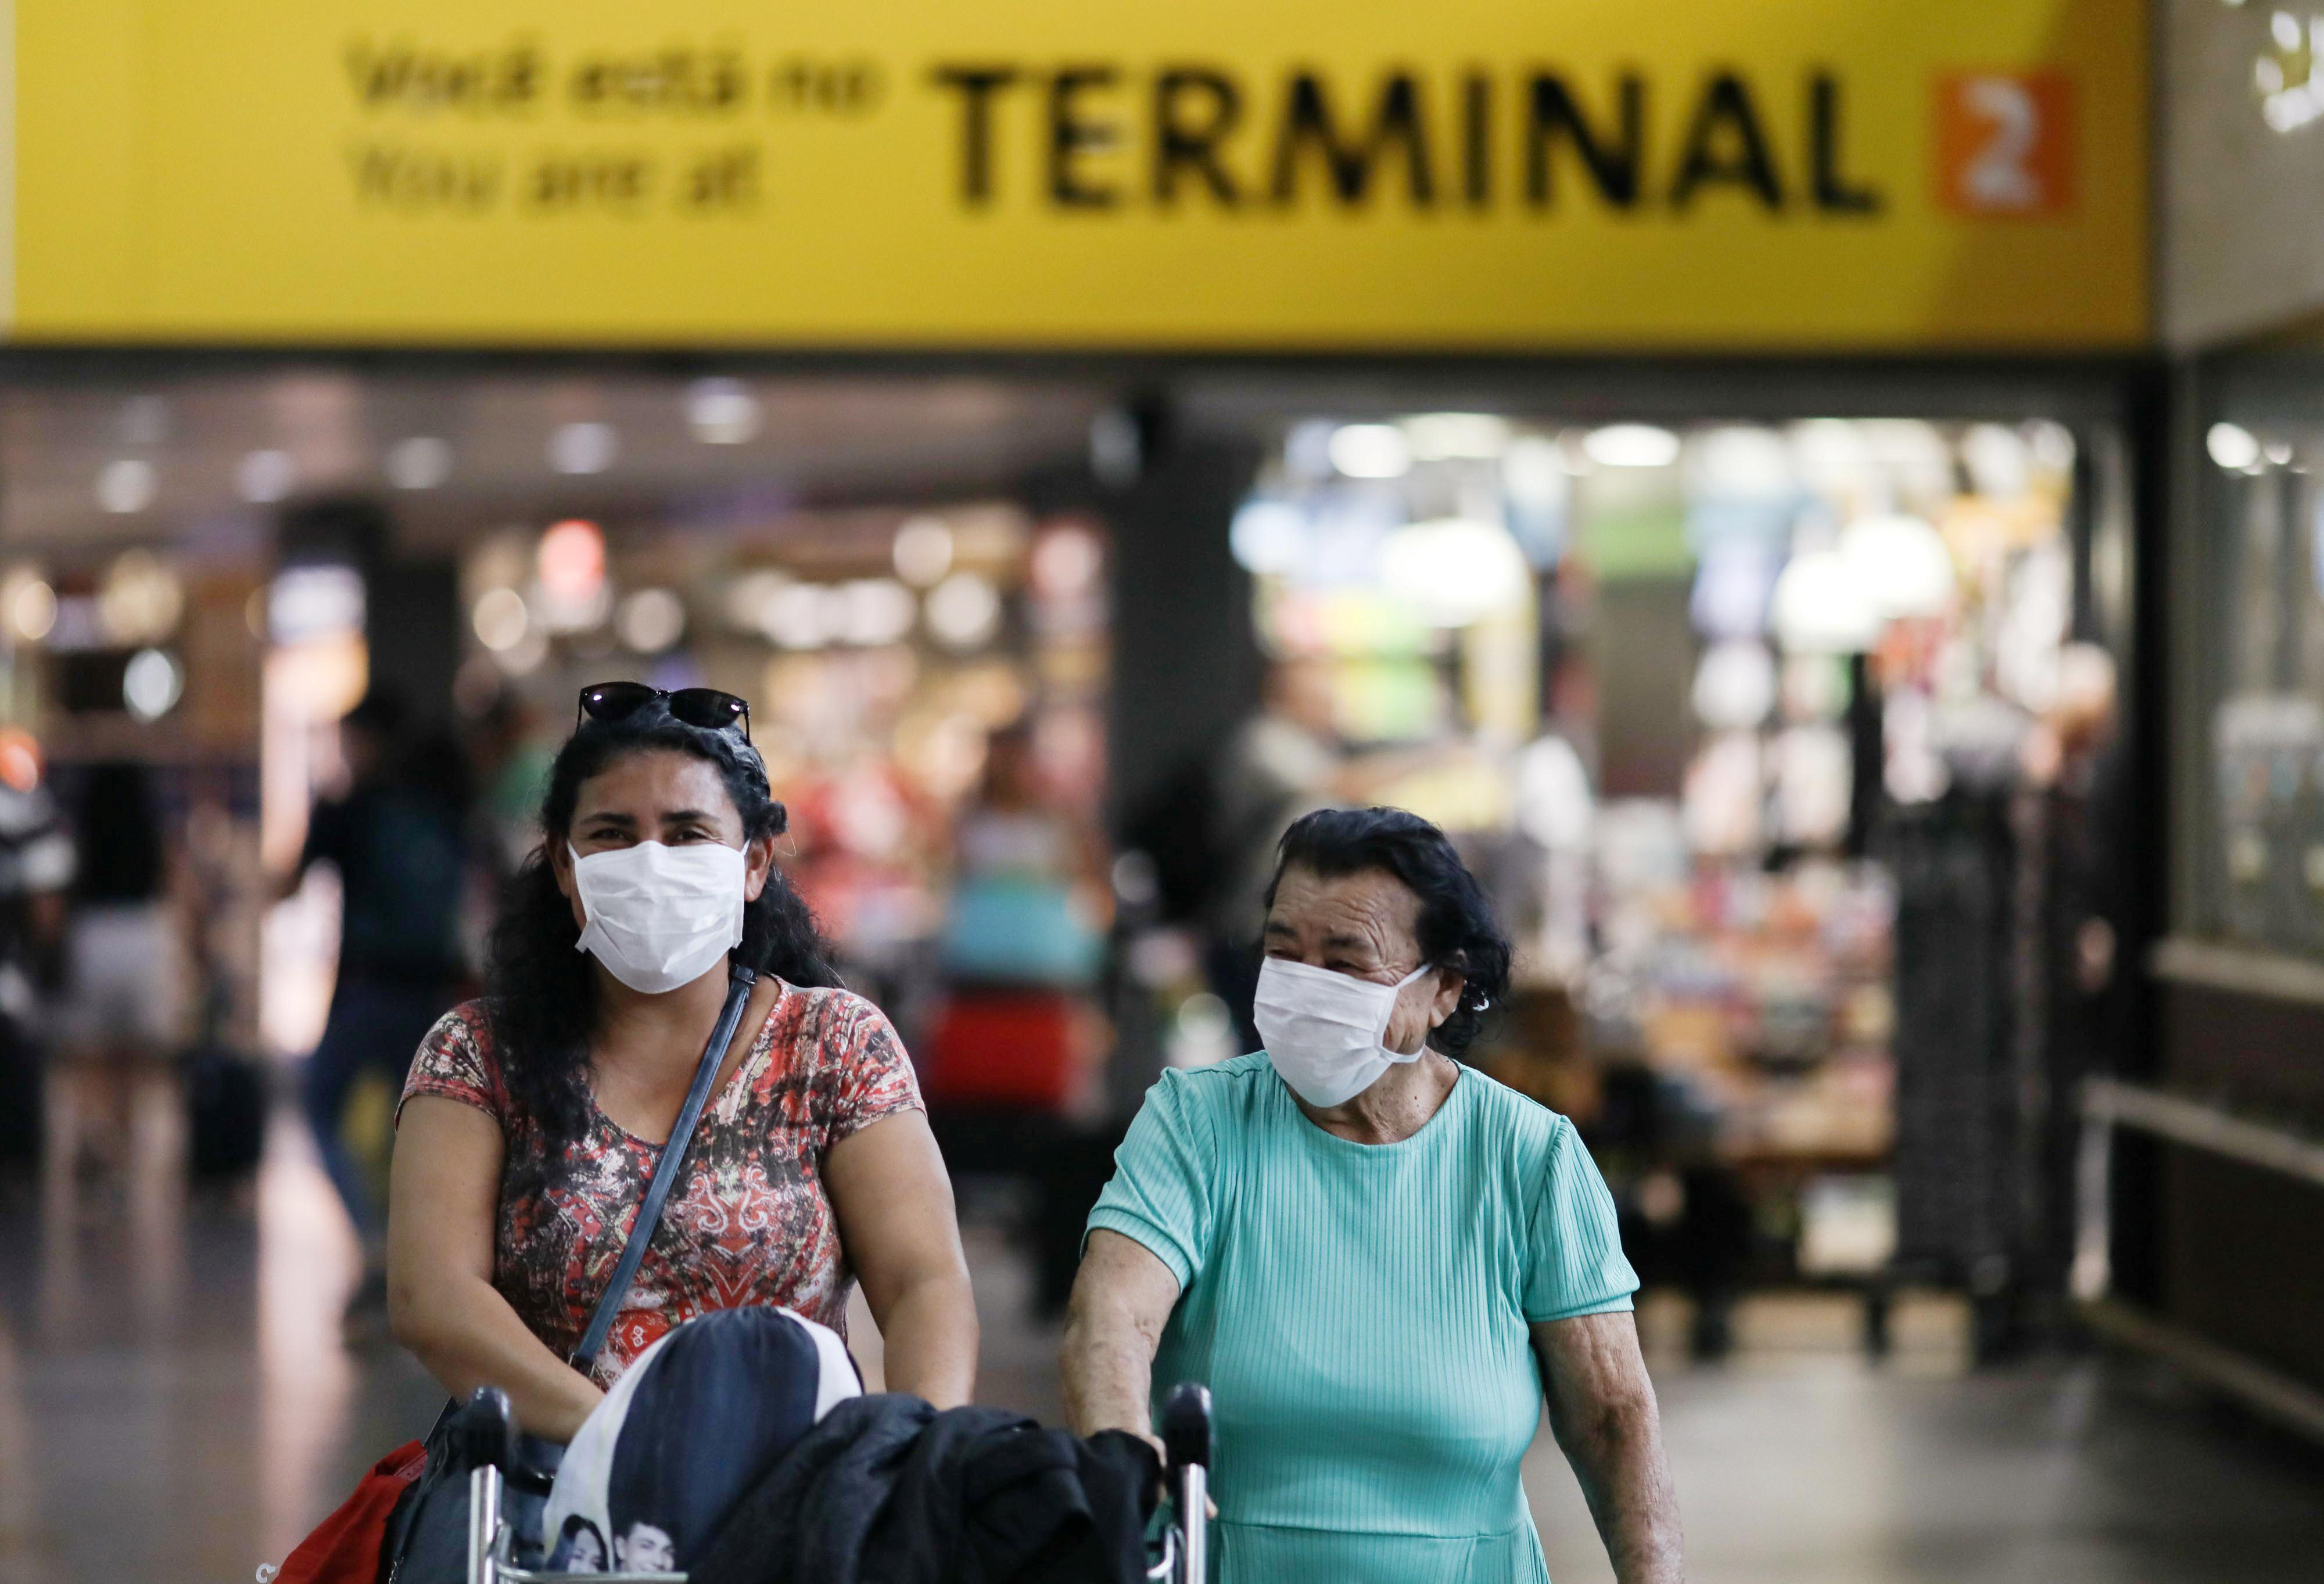 Passageiras usam máscara protetora no Aeroporto de Guarulhos